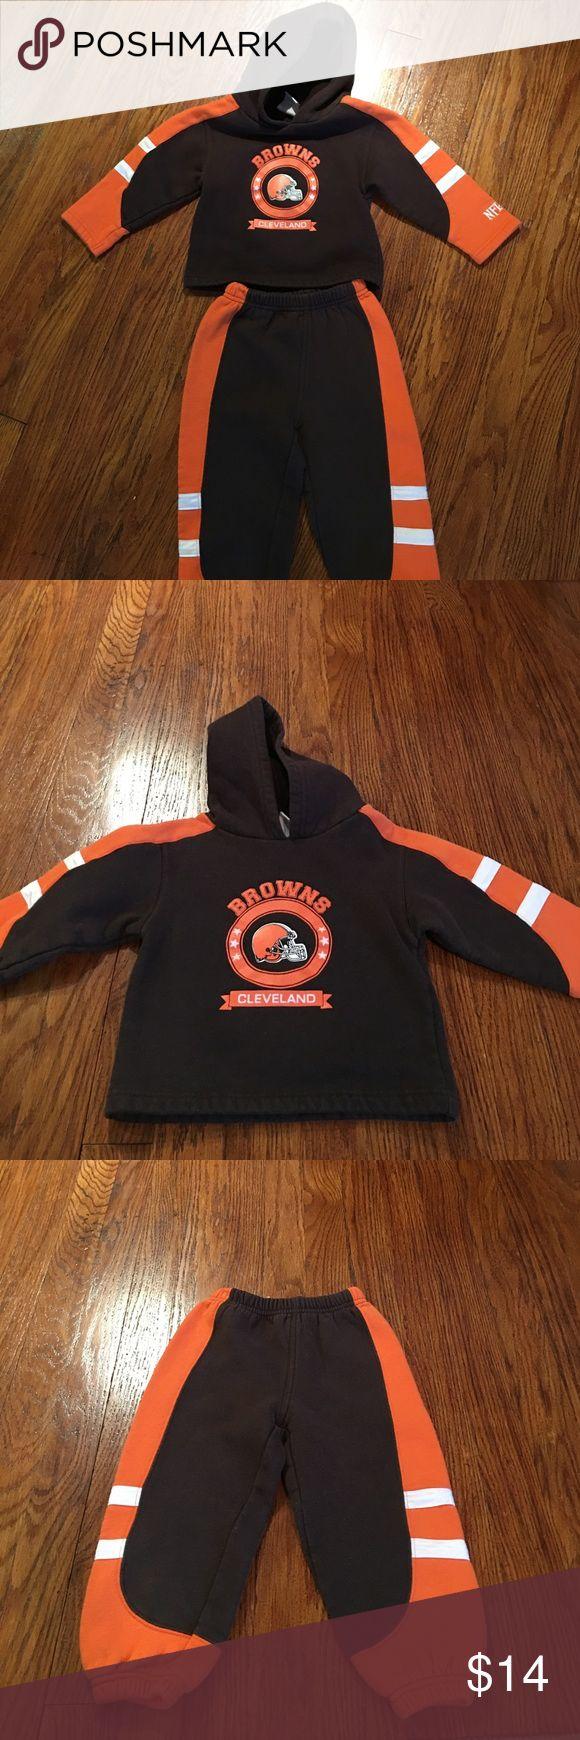 Cleveland Browns sweatsuit Minimal wear. Size 2T. nfl Matching Sets